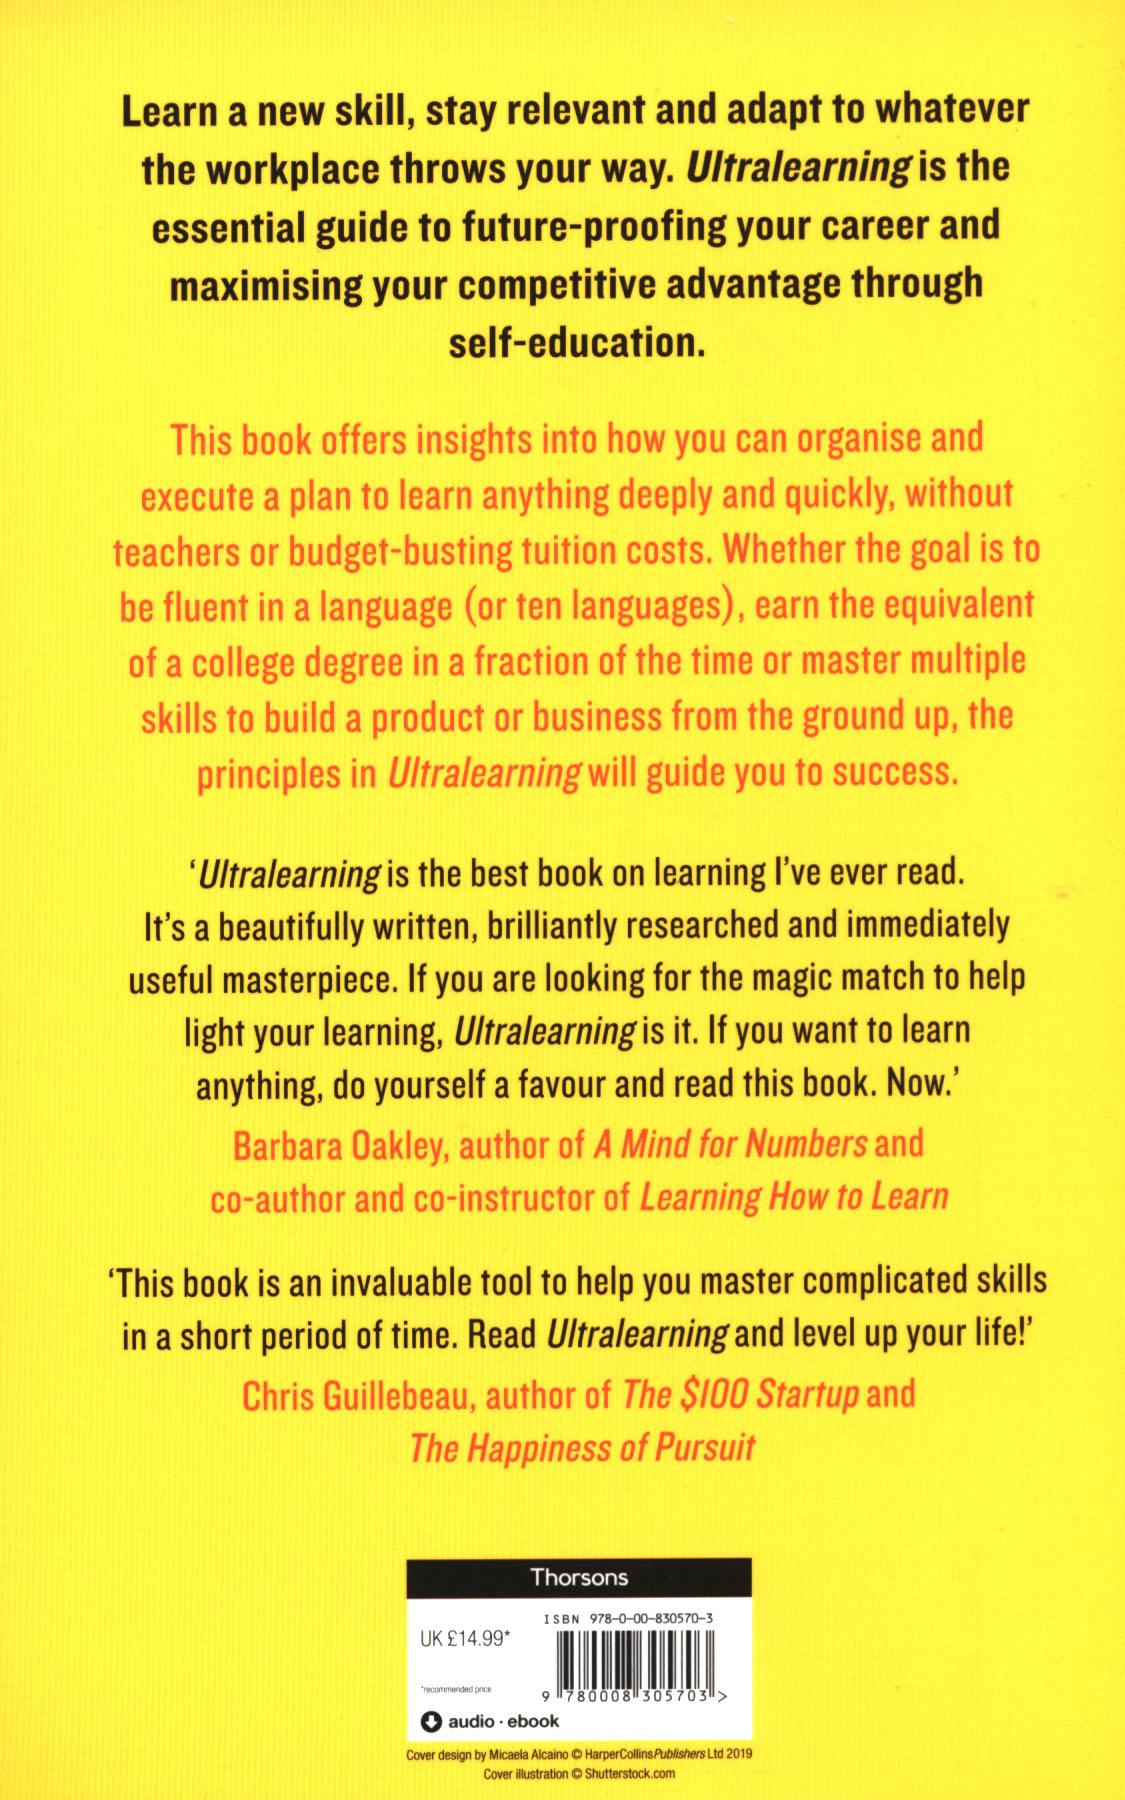 Ultralearning : accelerate your career, master hard skills